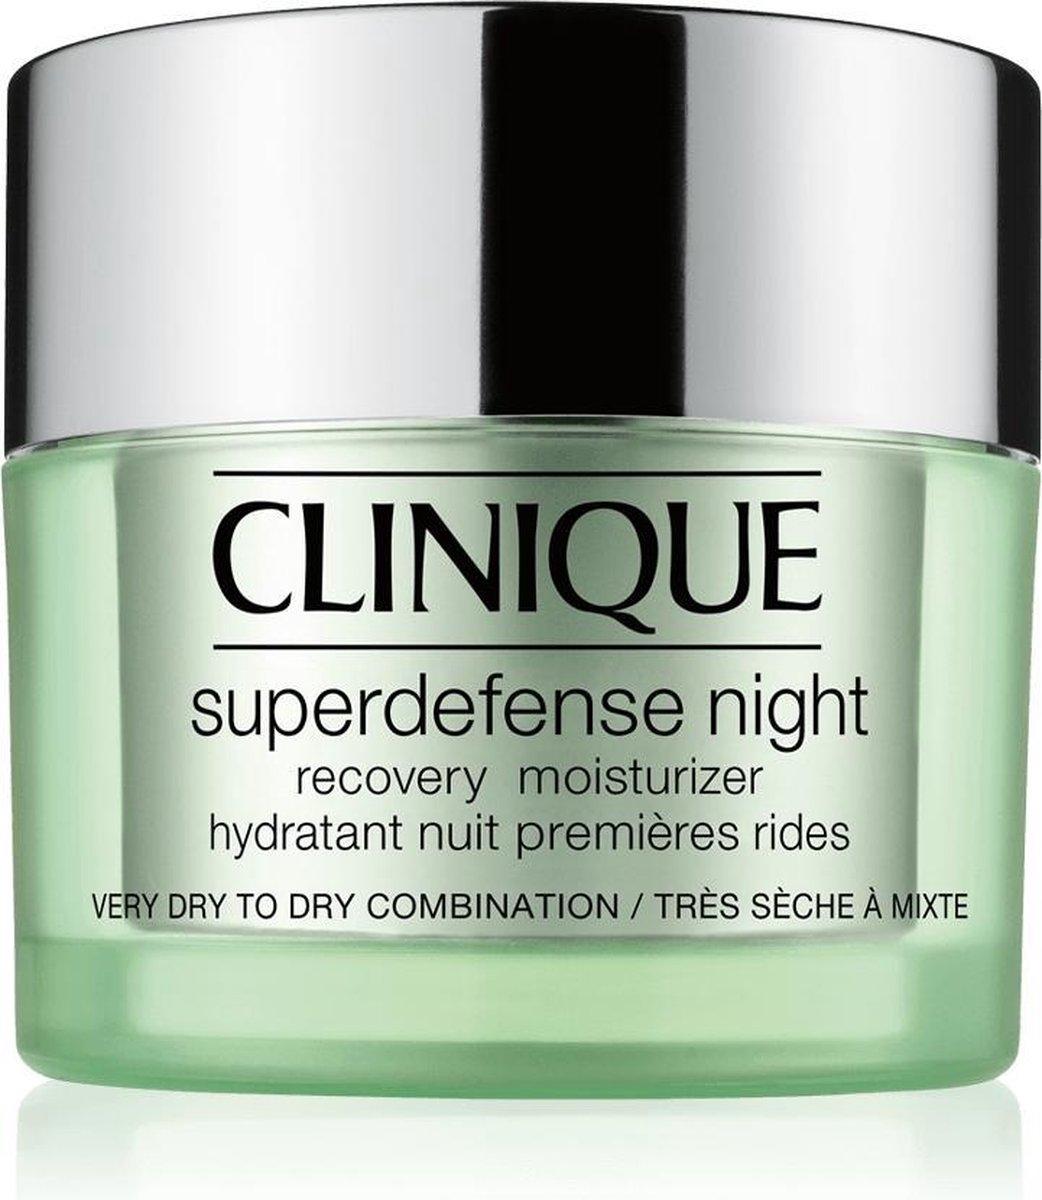 Clinique Superdefense Night Recovery Moisturizer Nachtcr me Droge huid - 50 ml